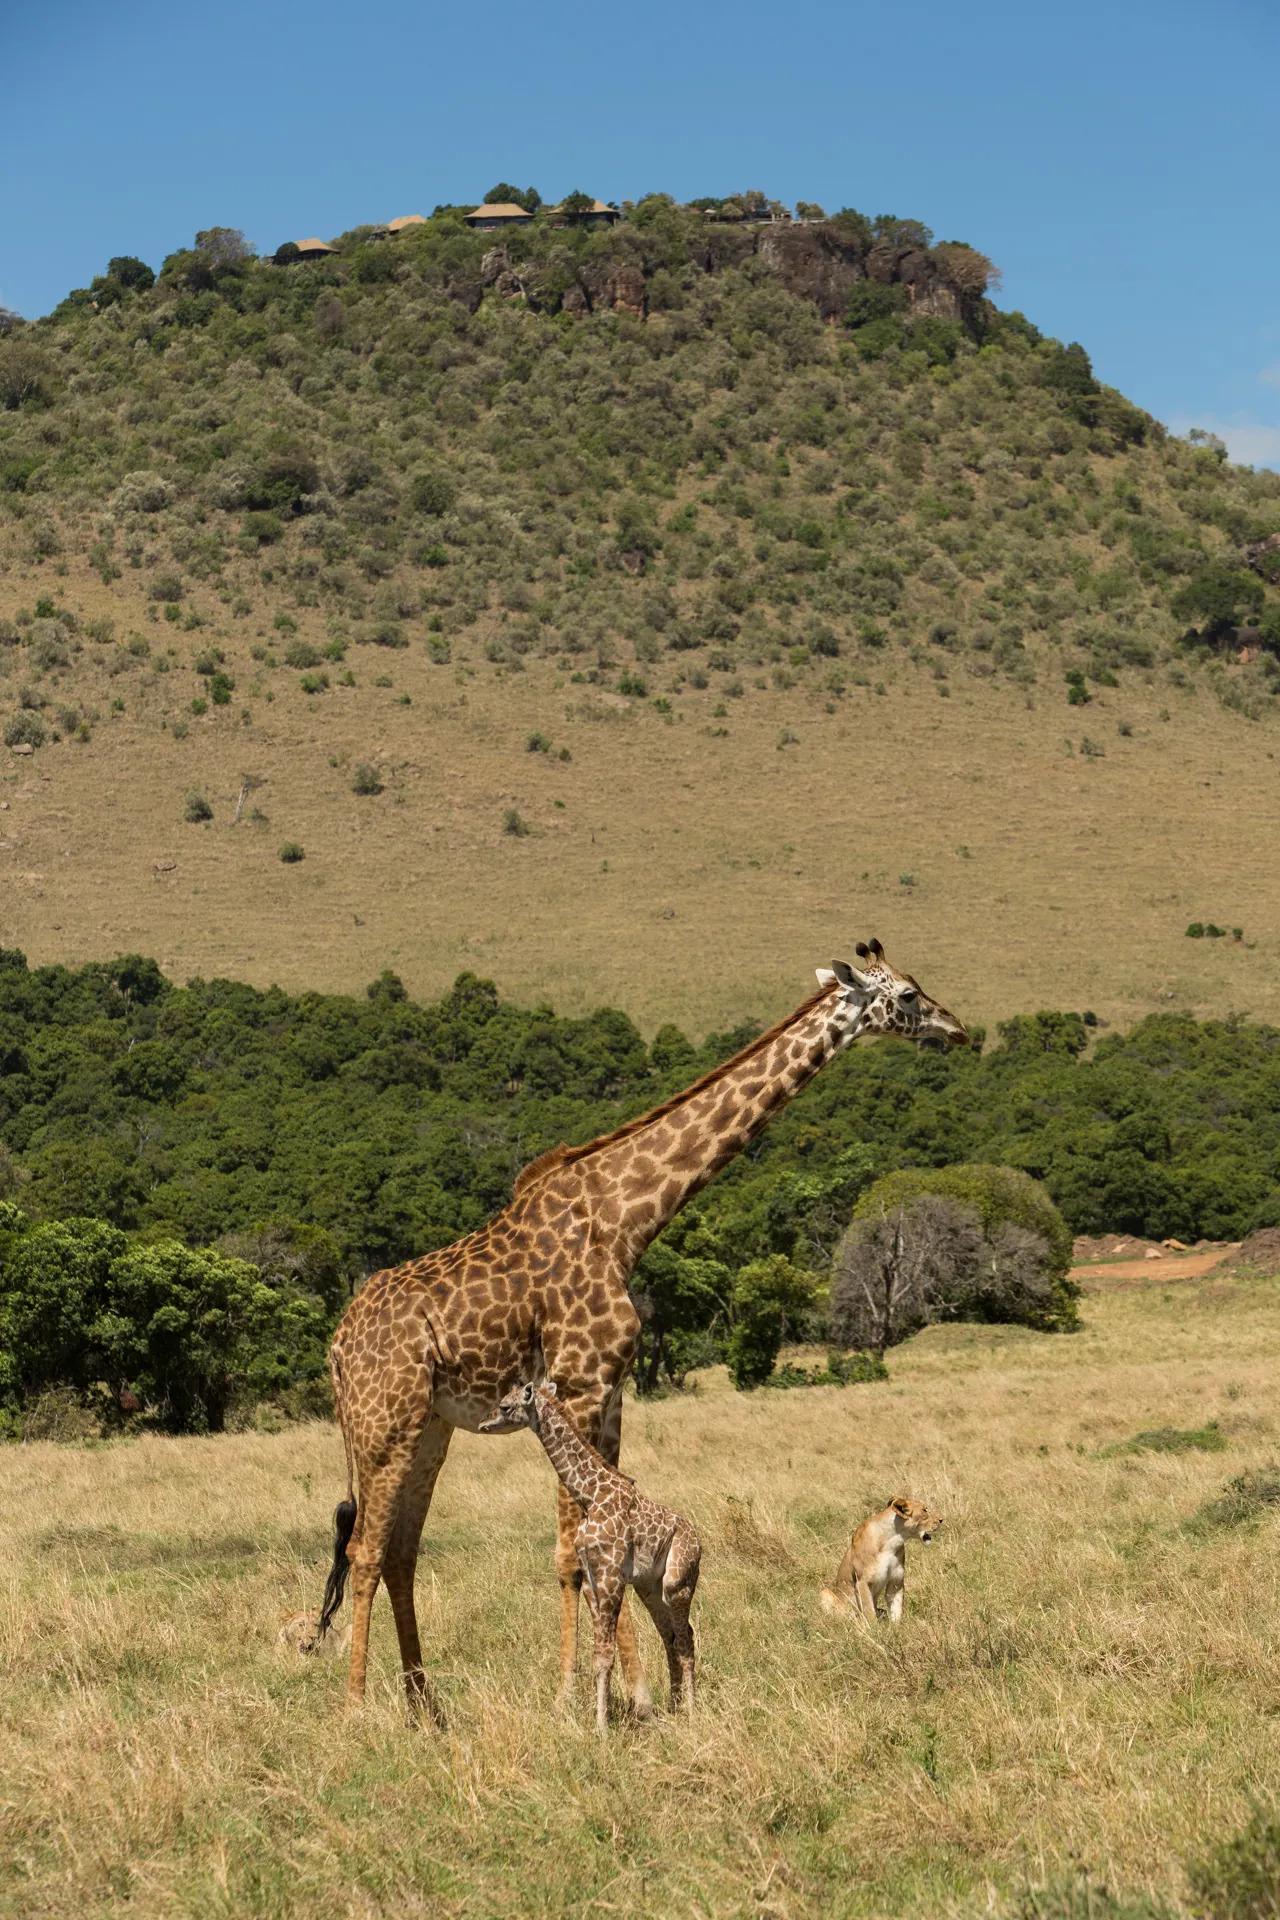 Giraffe and lioness